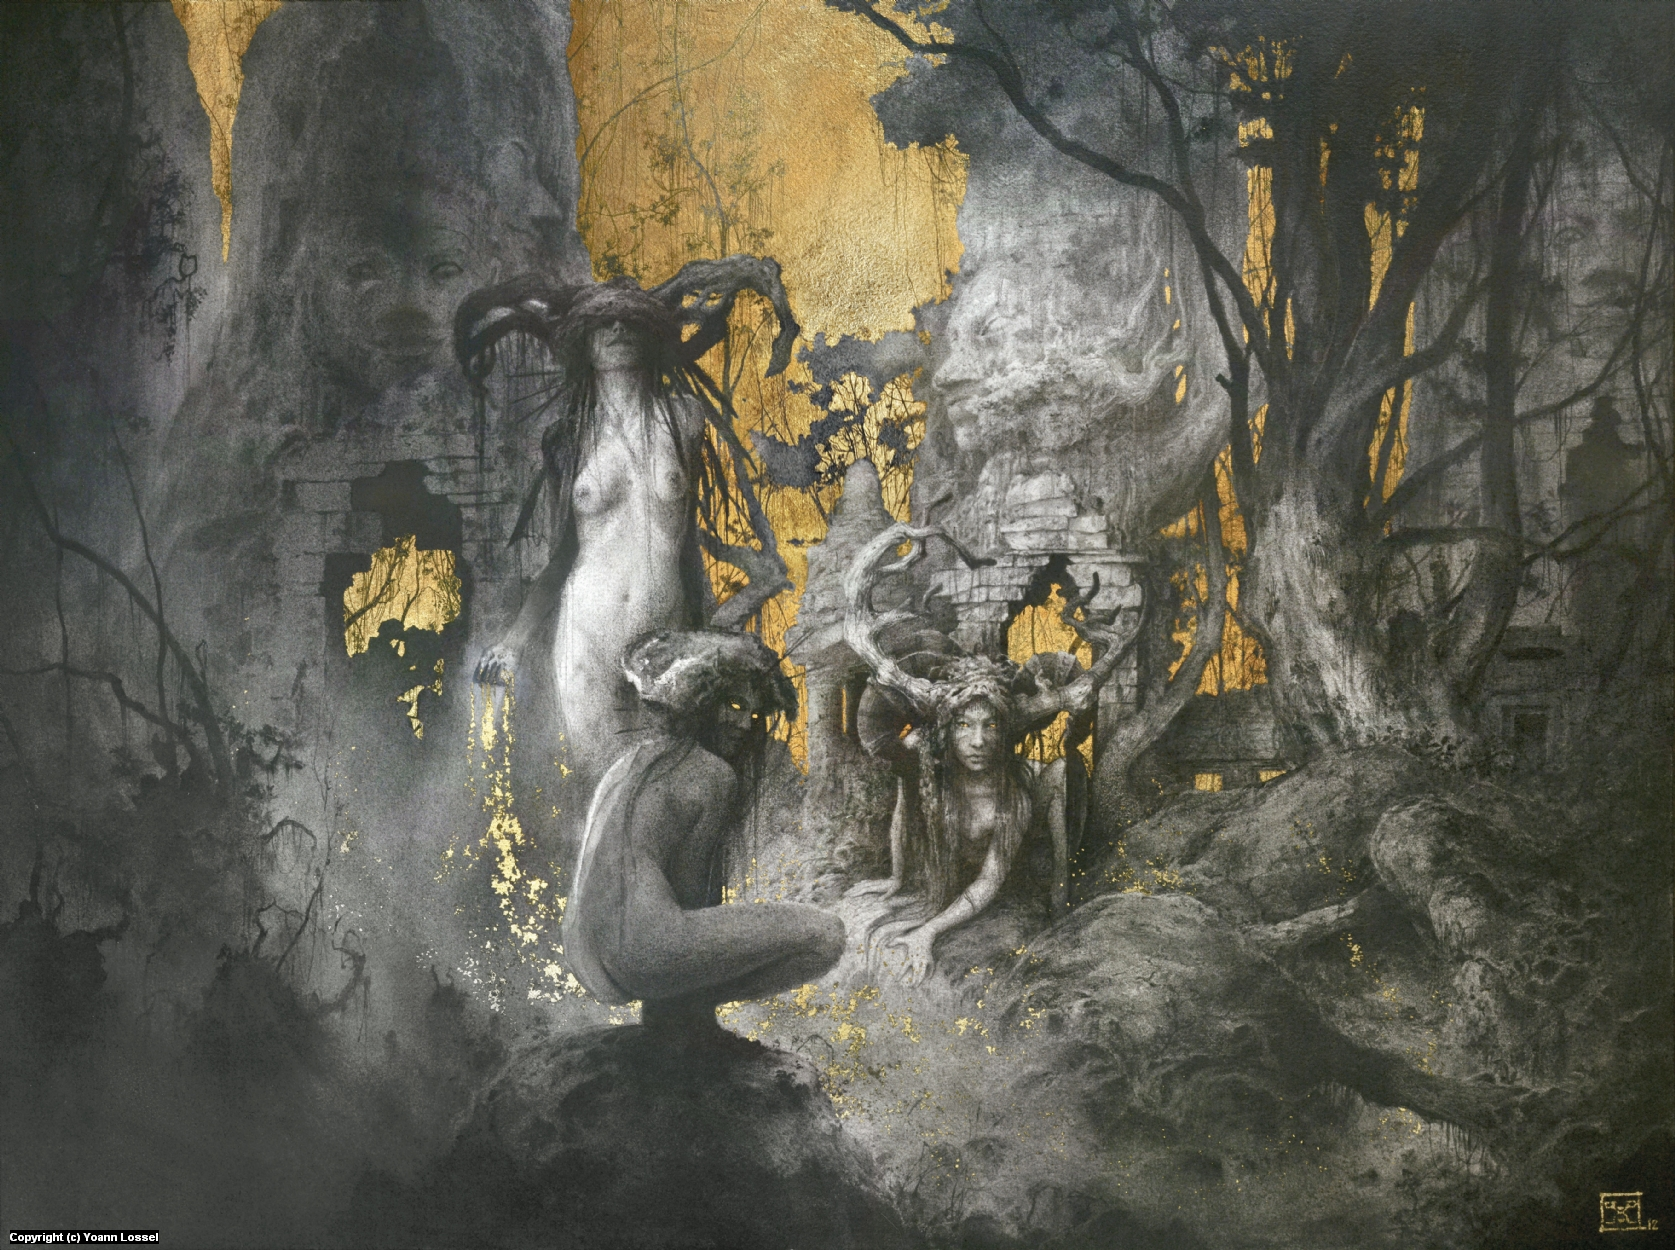 The Golden Age Artwork by Yoann Lossel